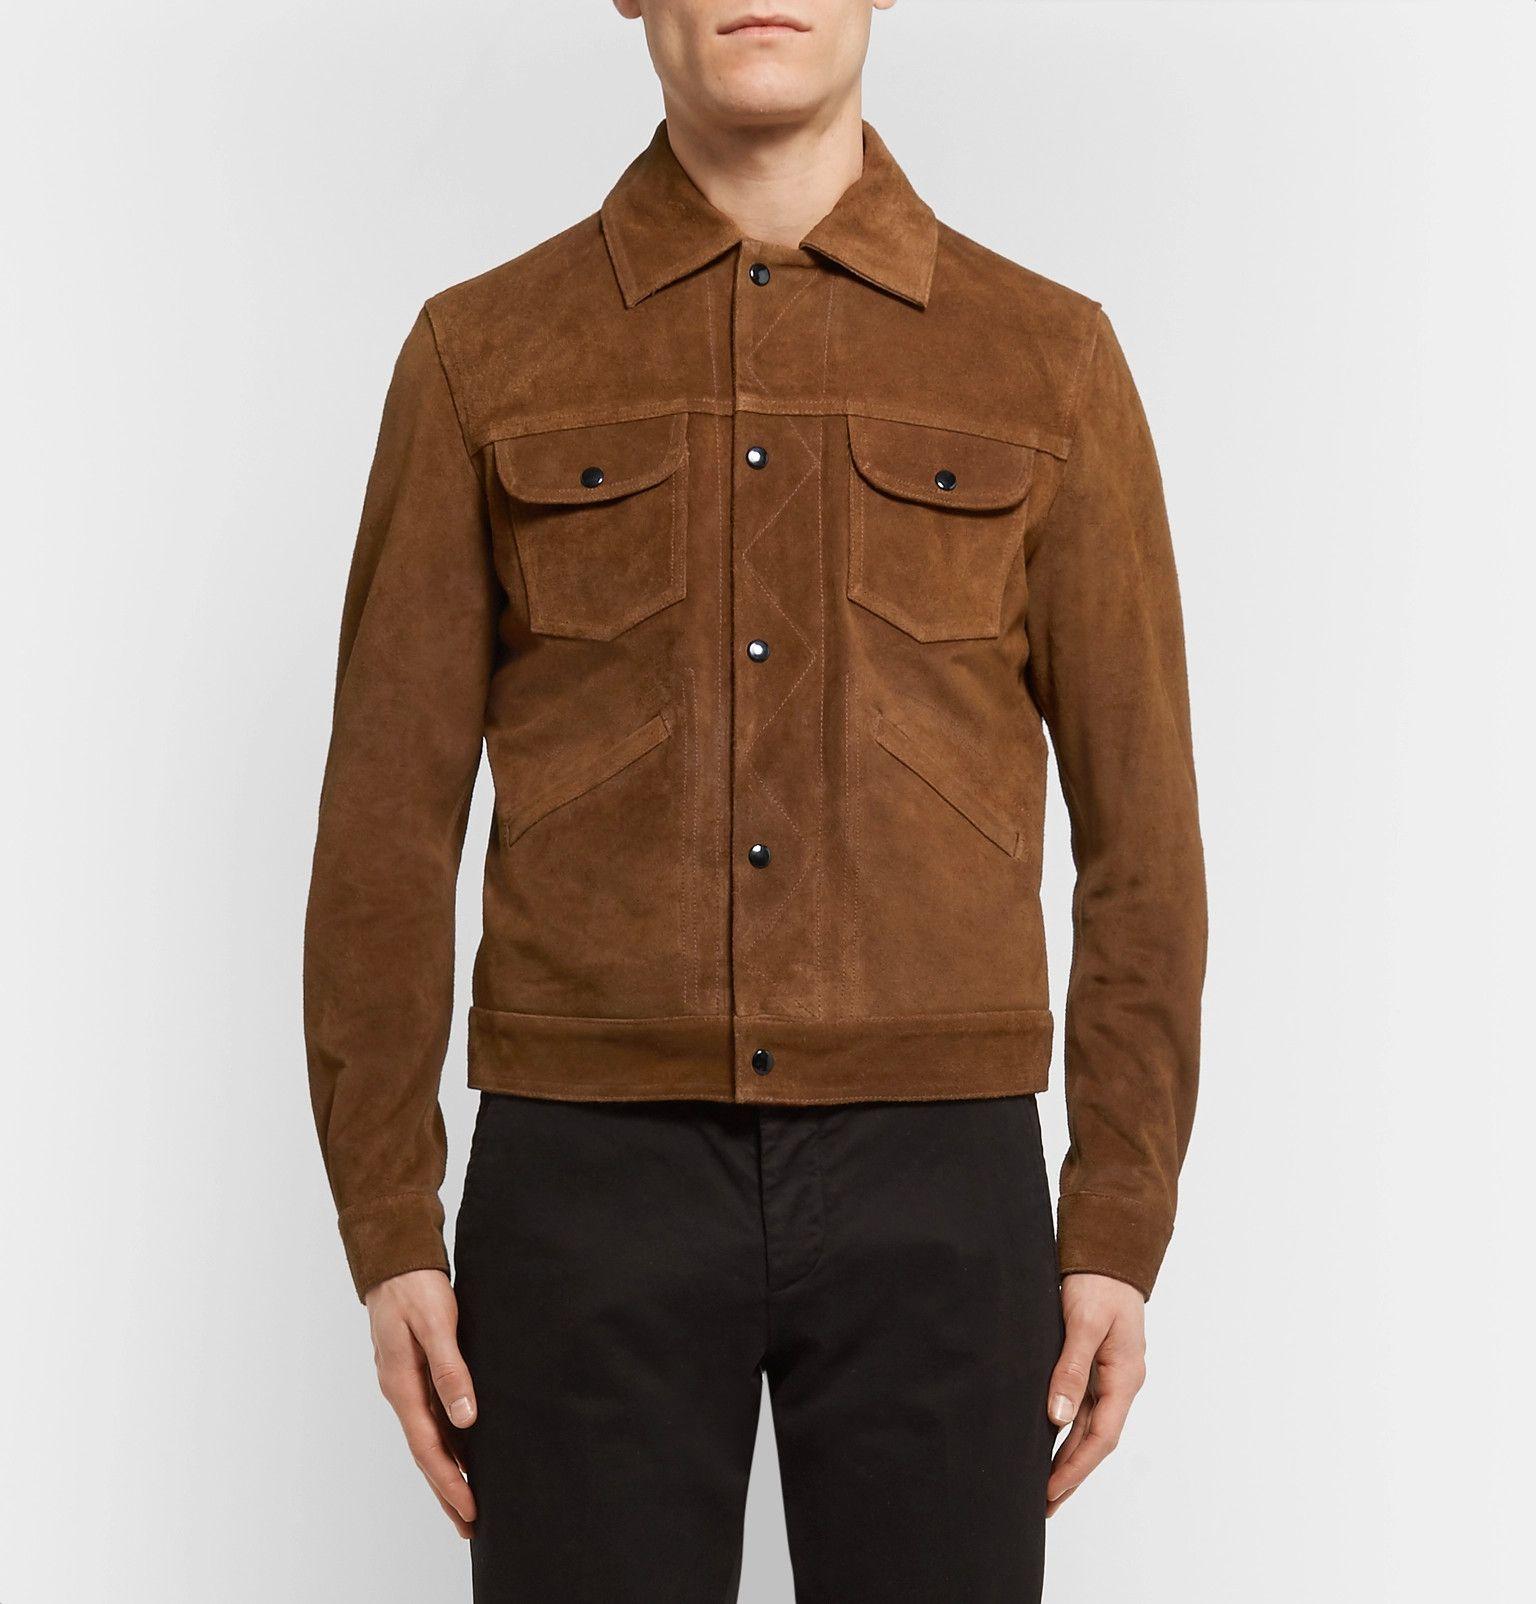 Coats and Jackets for Men | Designer Menswear